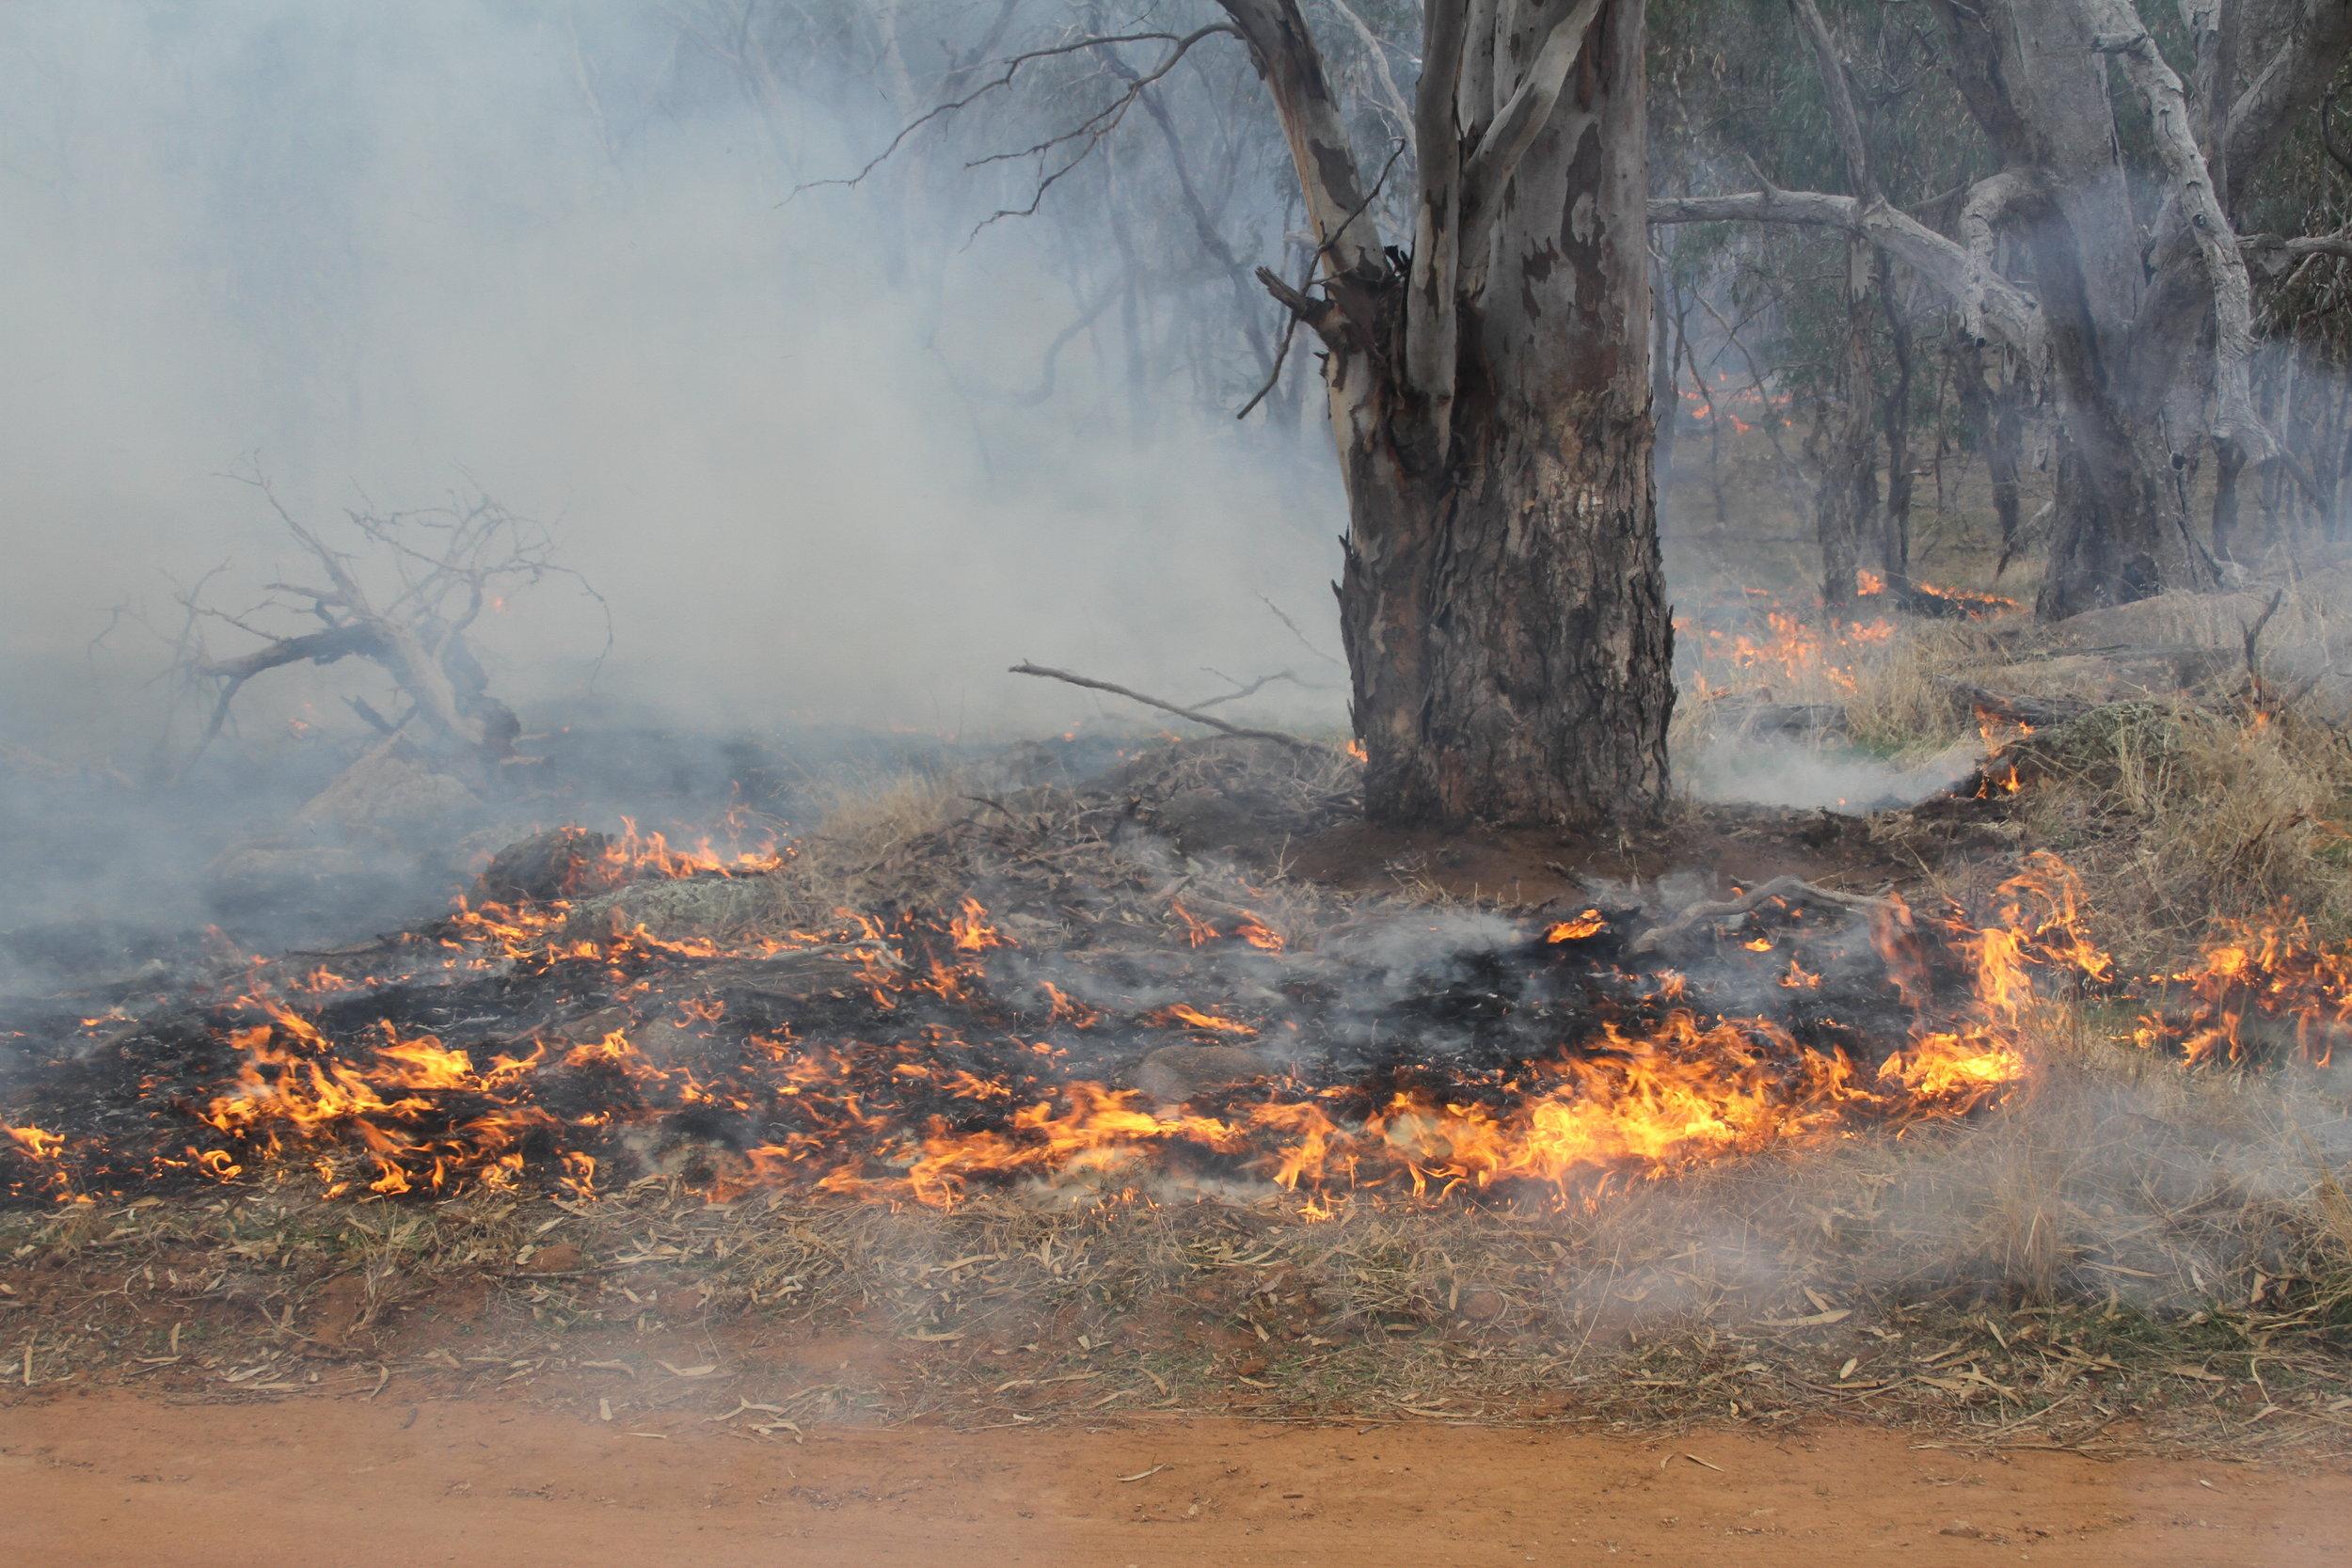 A recent cultural burn on Dja Dja Wurrung Country. Photo: Rafe Pfitzner.